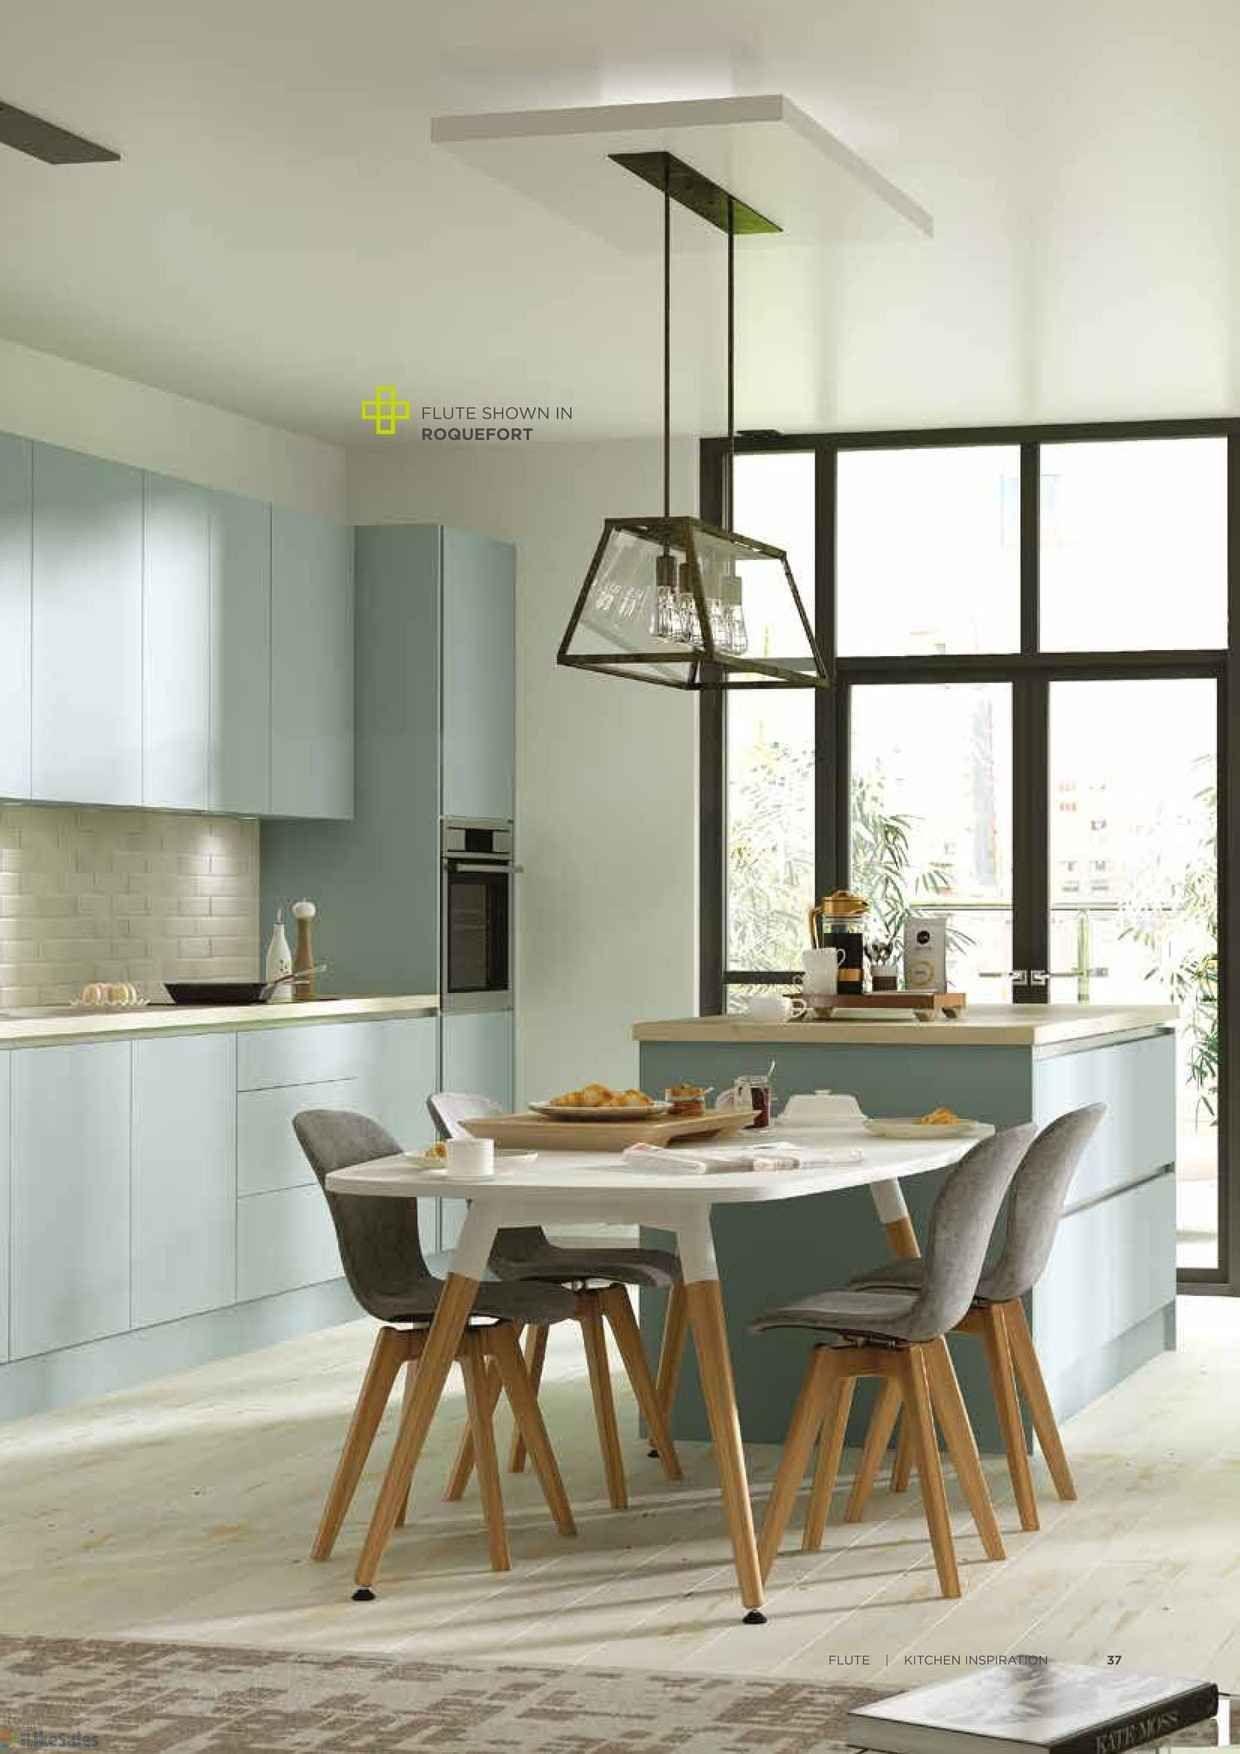 Image result for homebase flute kitchen roquefort | kitchen island ...